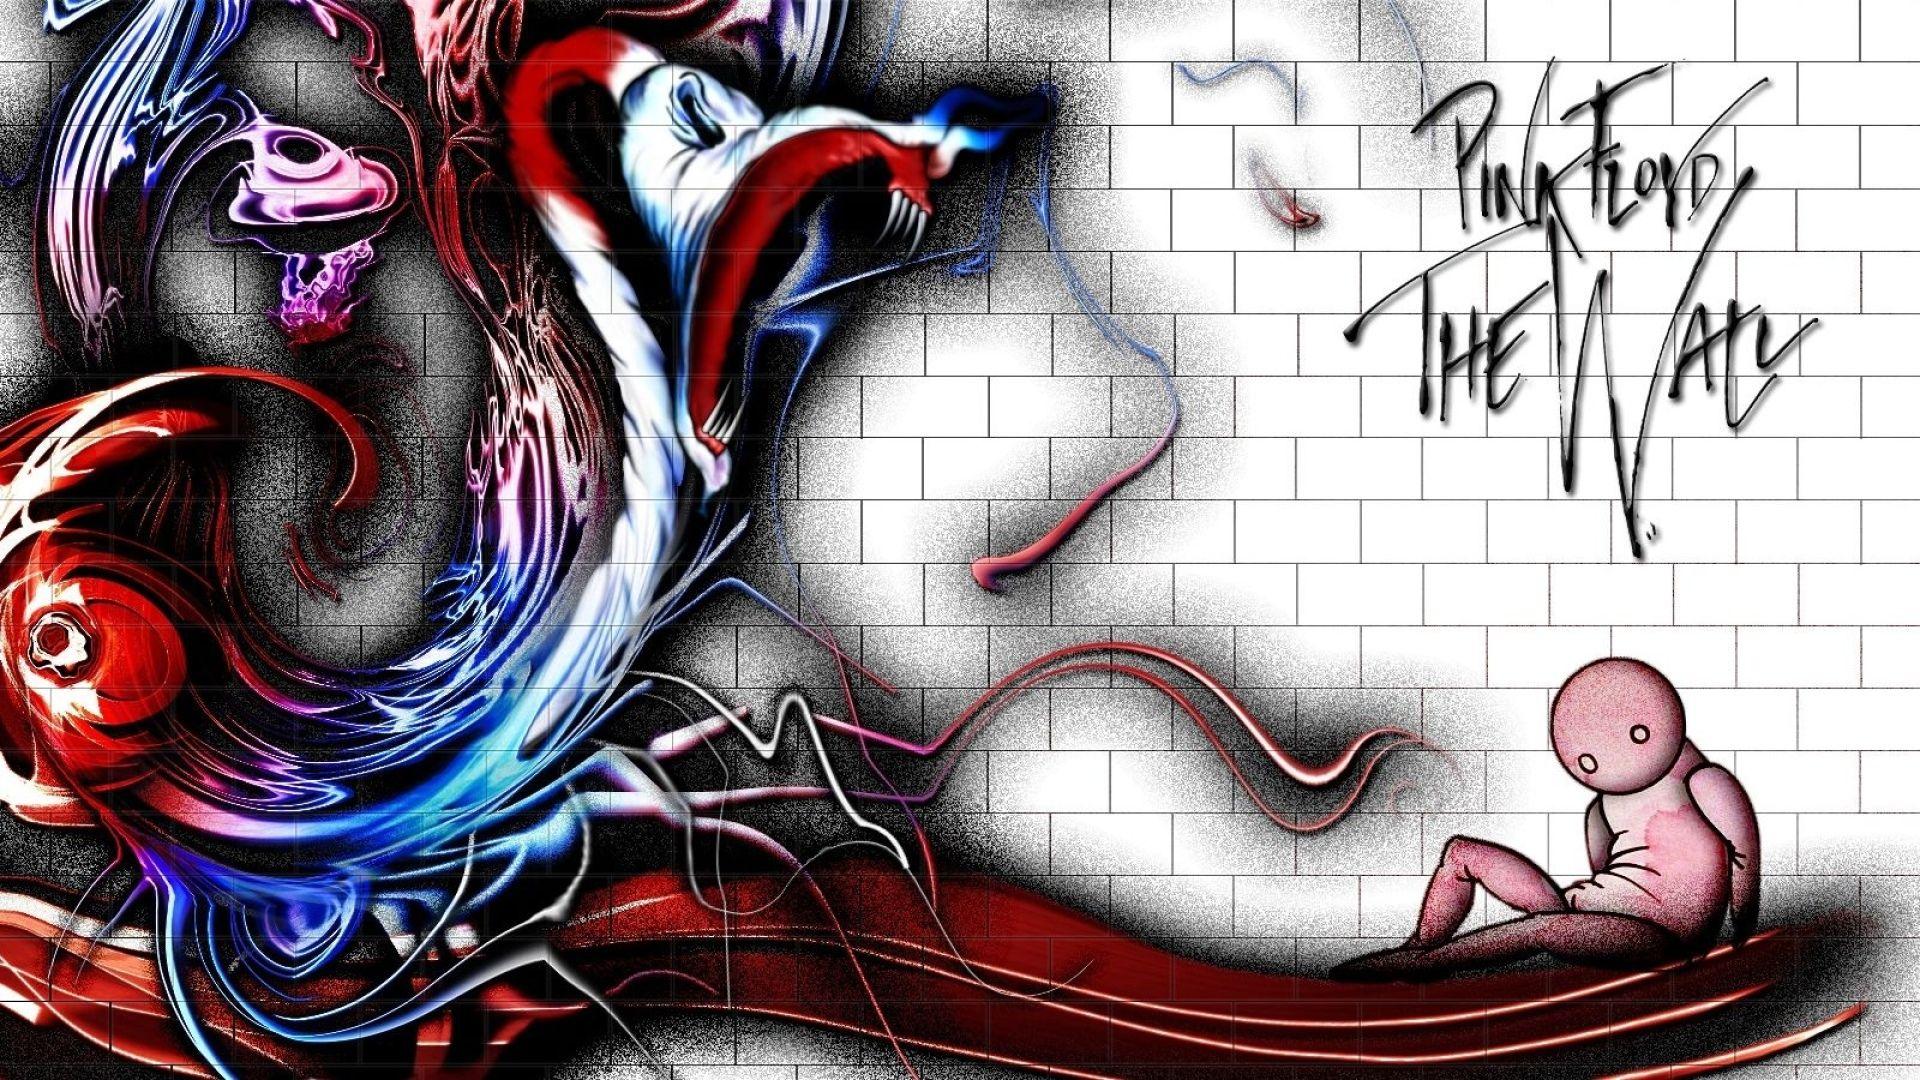 Motorhead bastards music hd wallpaper 21996 hq desktop - M Sica Pink Floyd Papel De Parede Music Bandsrock Bandshd